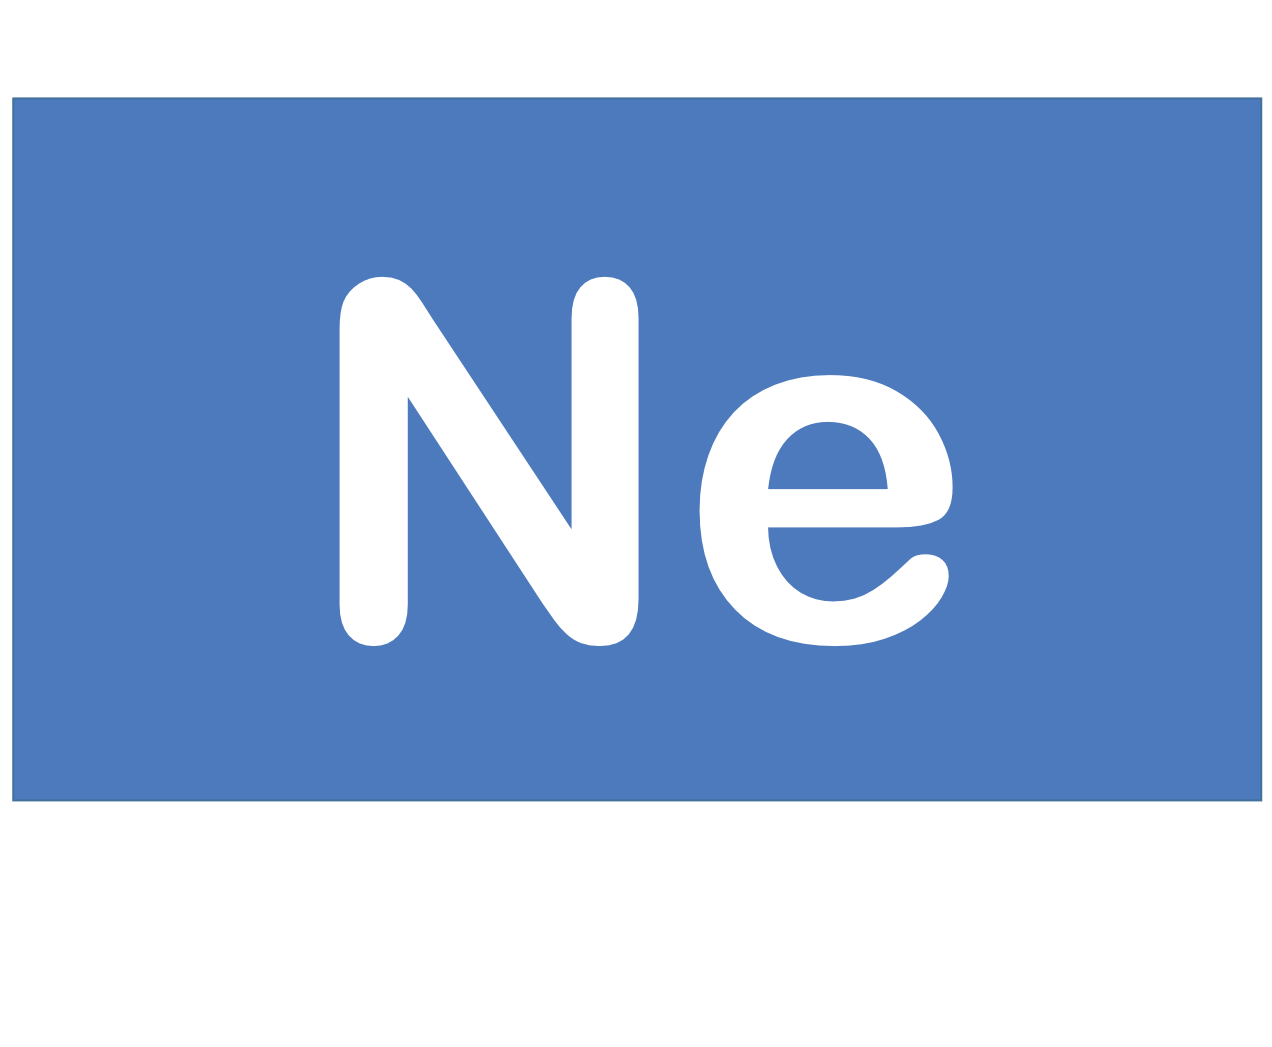 10 Ne ネオン Neon 元素 記号 周期表 化学 原子